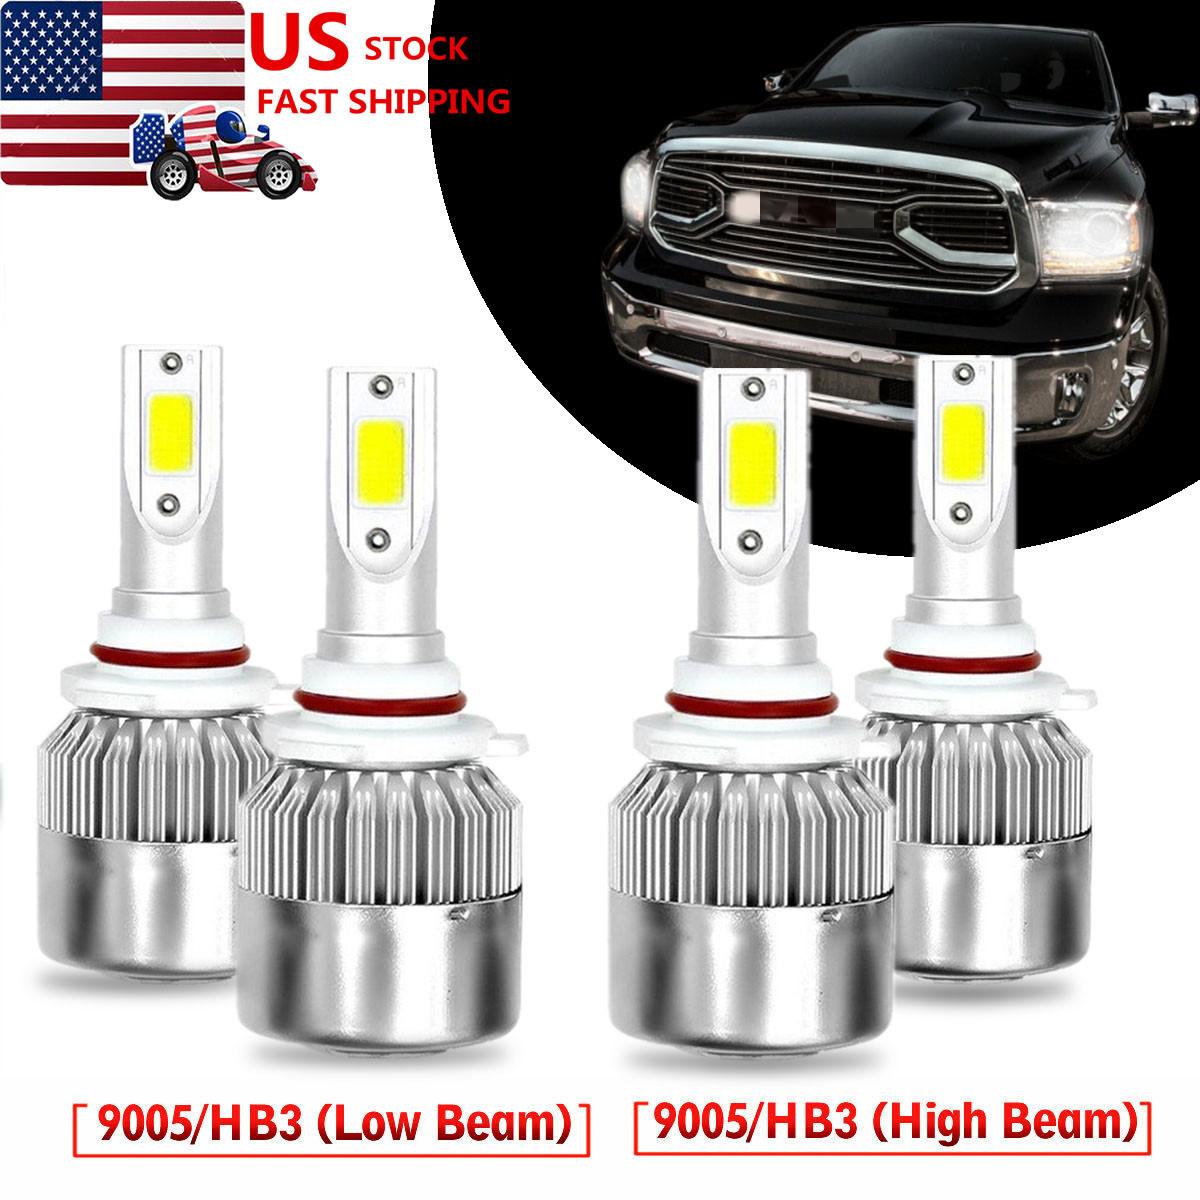 LED Headlight Kit 9005 HB3 6000K White High Beam LED for Cadillac CTS 2003-2007